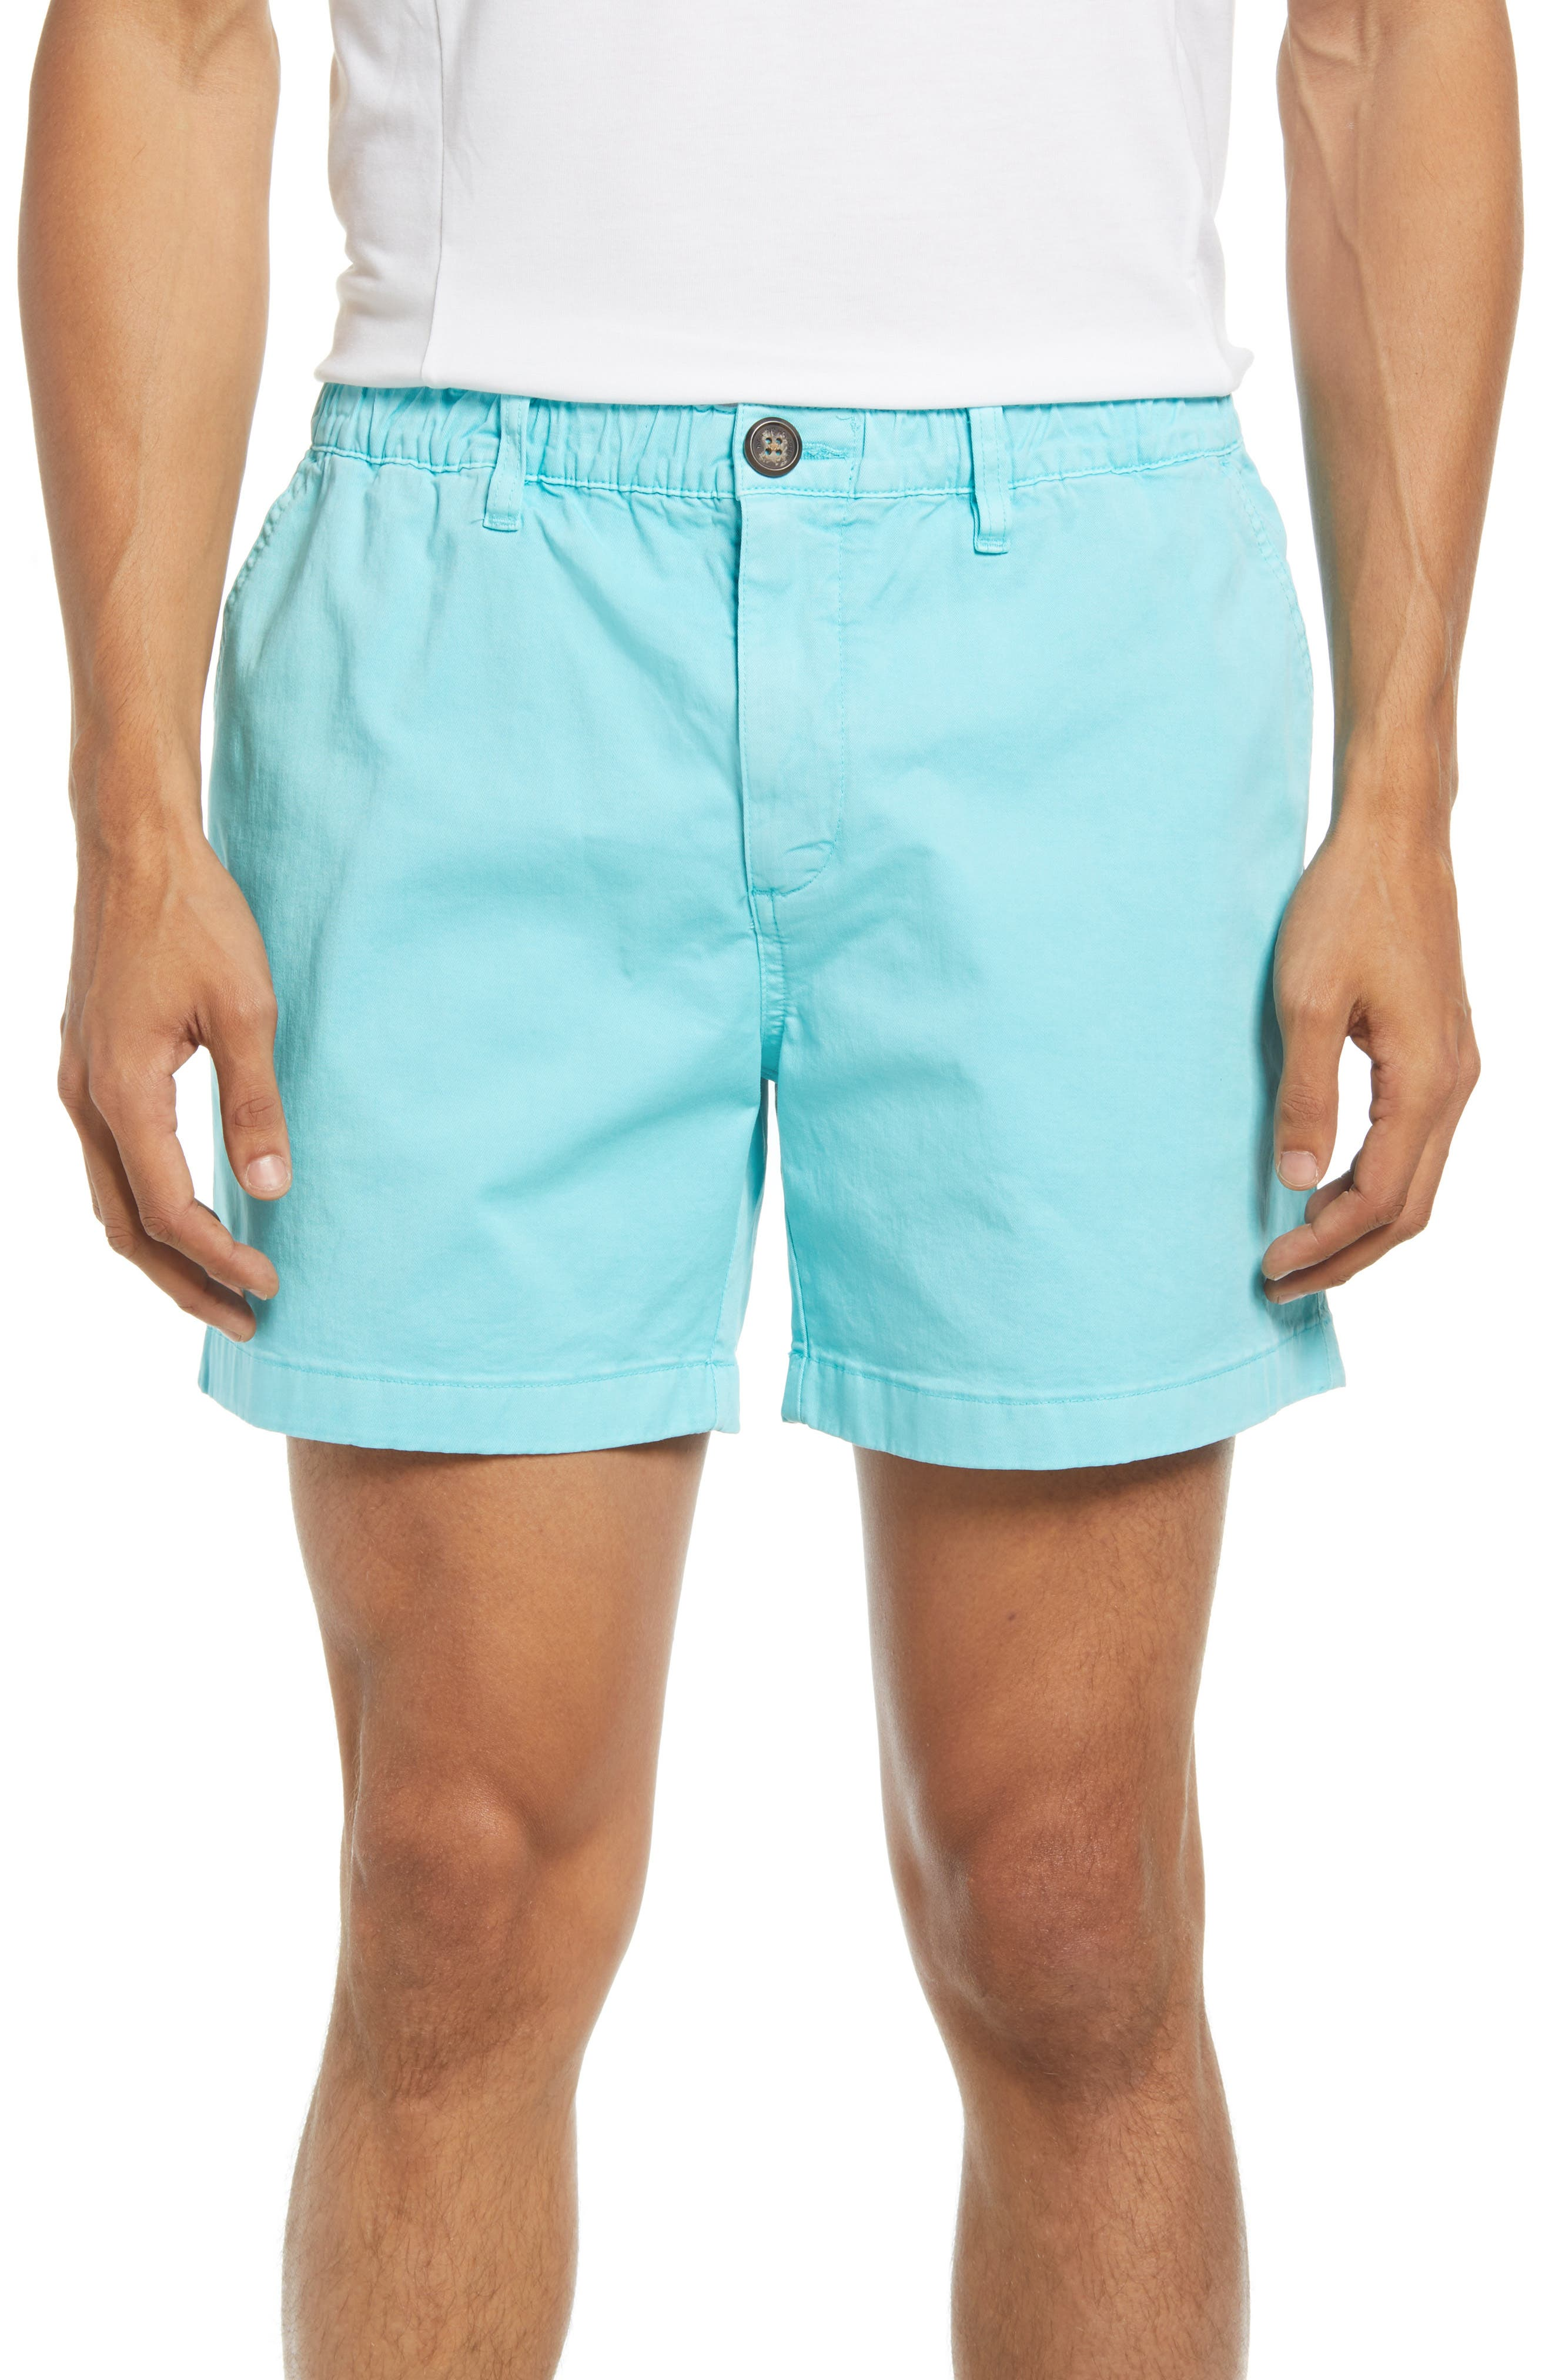 The Light Blue Vault Shorts